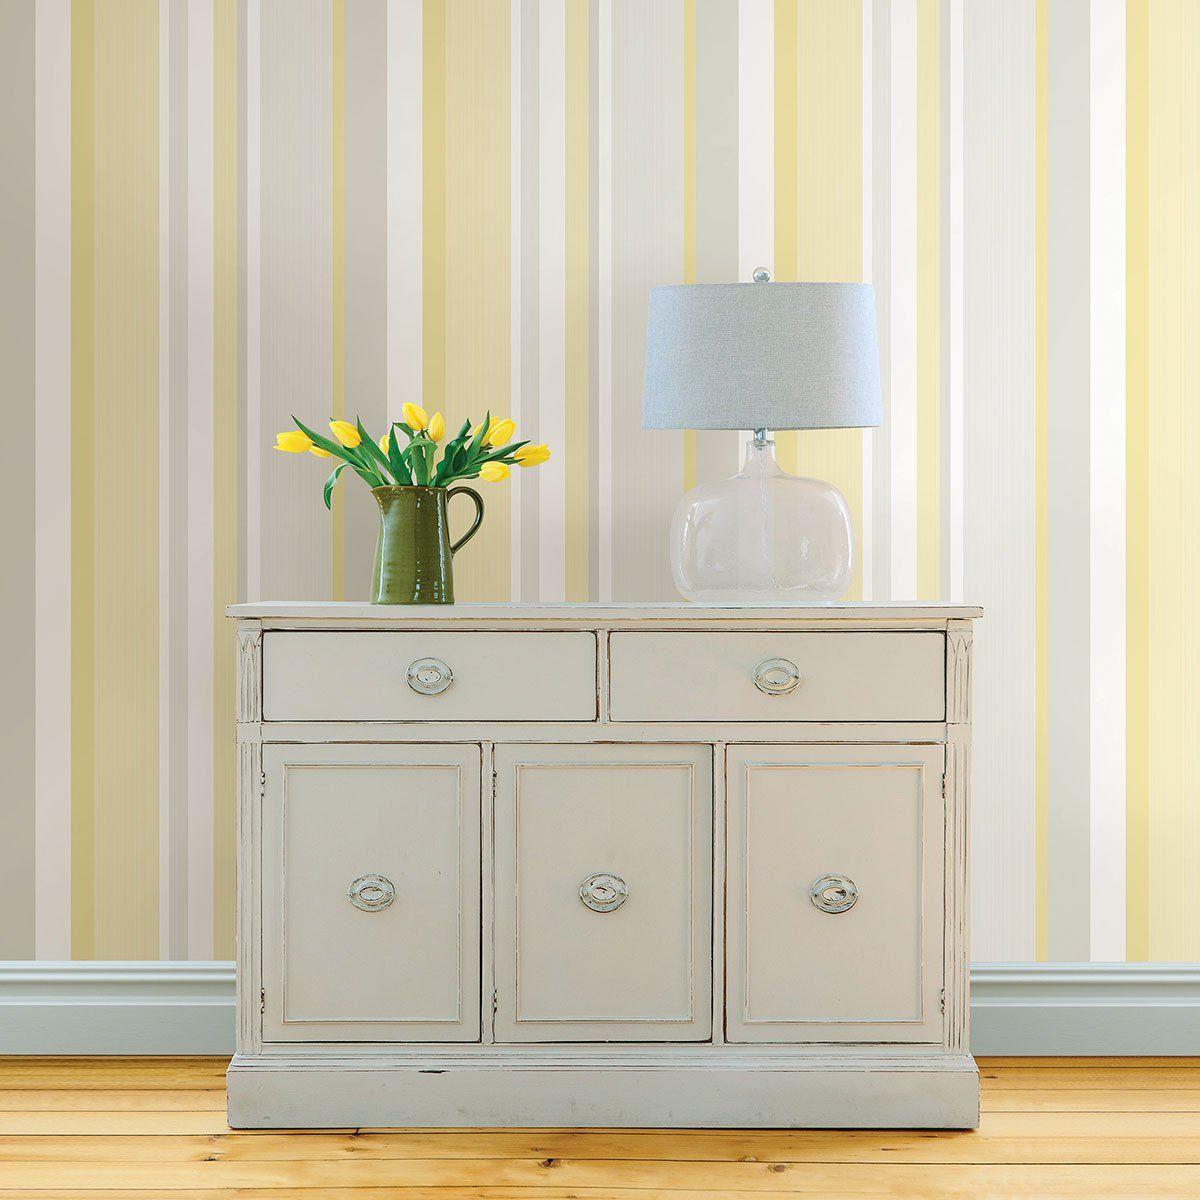 Yellow Awning Stripe Peel and Stick Wallpaper Peel